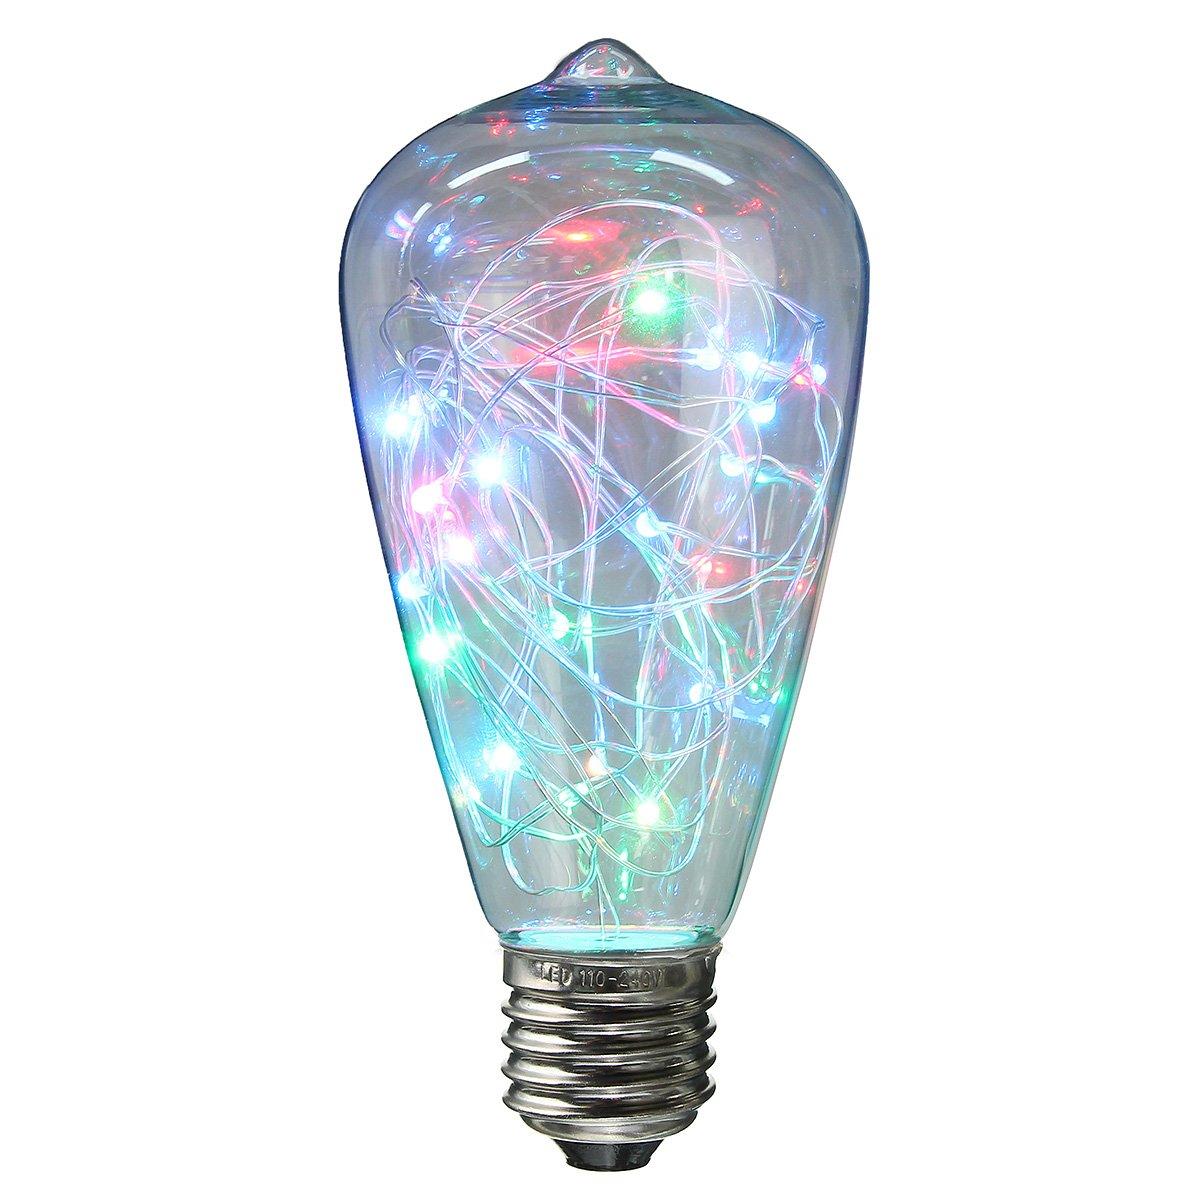 KINGSO E27 LED Edison Lampe RGB LED Lampe Globe Vintage Glühbirne Bunte  Lichterkette Lampe Bulb Deko